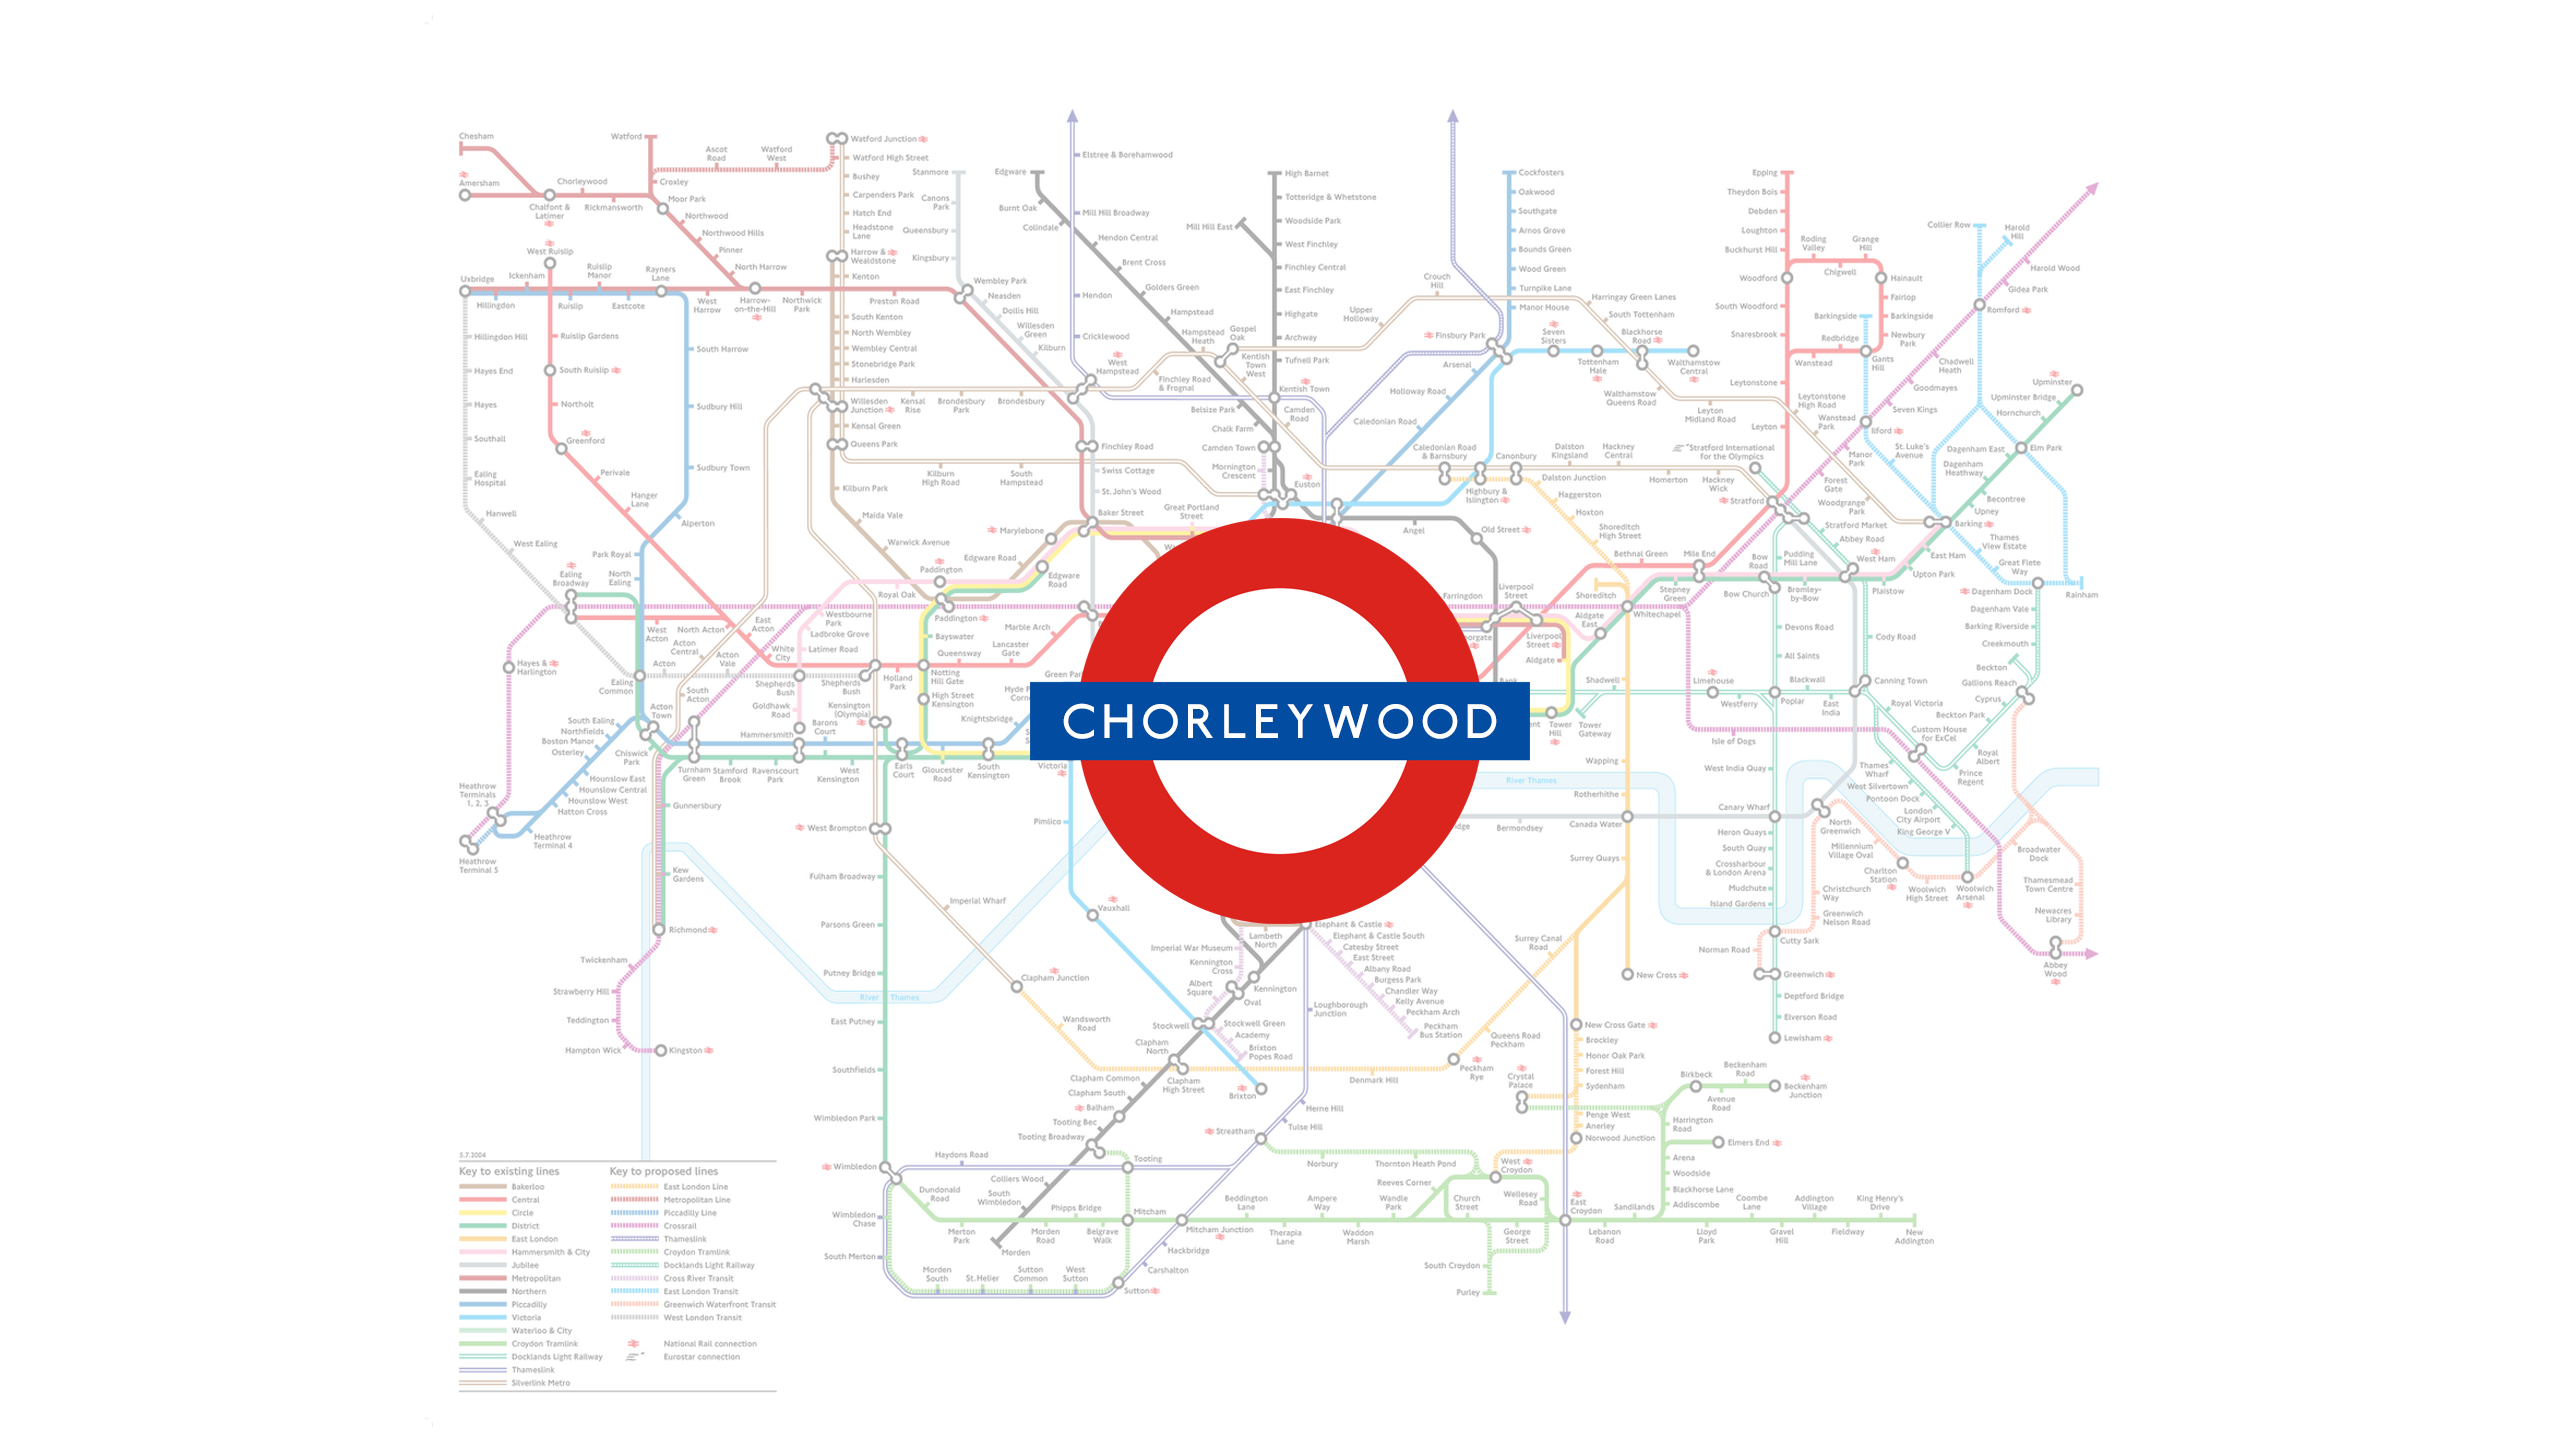 Chorleywood (Map)